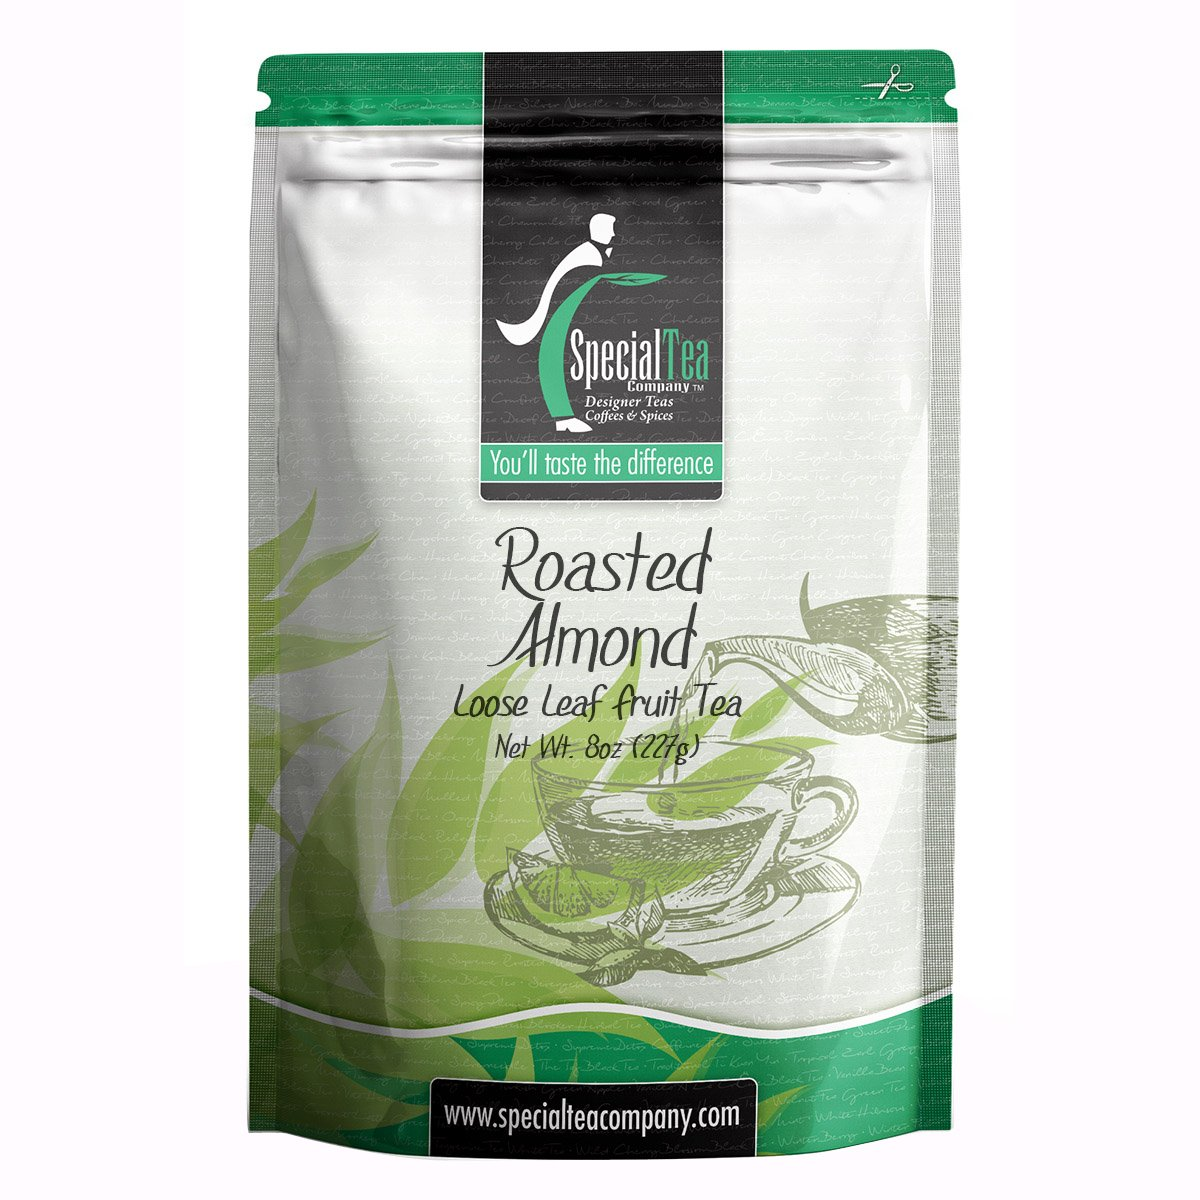 Special Tea Loose Leaf Tea, Roasted Almond Fruit, 8 Ounce